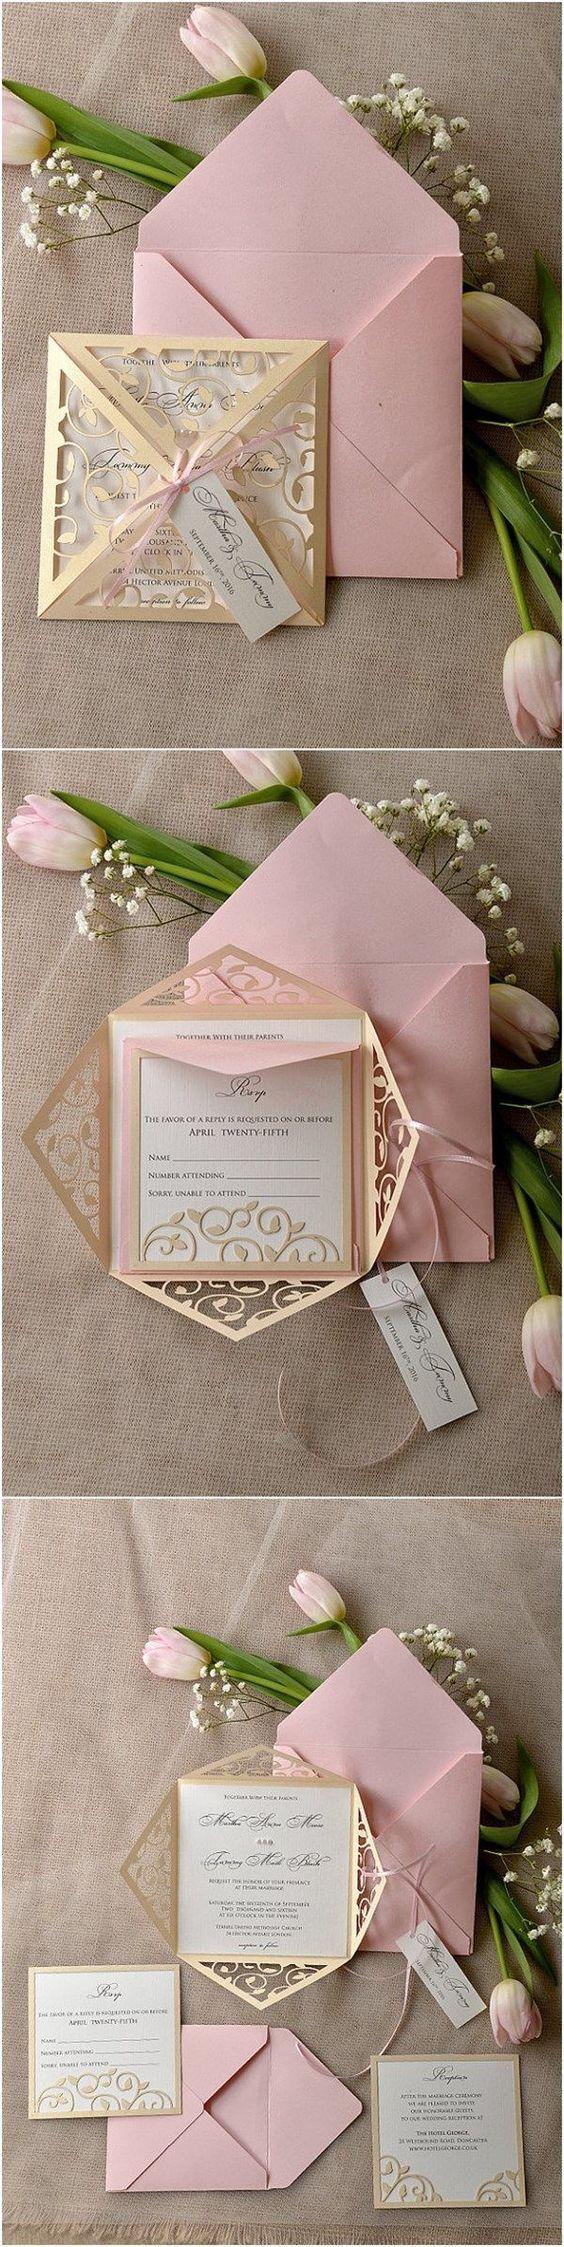 Rustic Wedding Invitations Weddinginvitation Cocomelody All